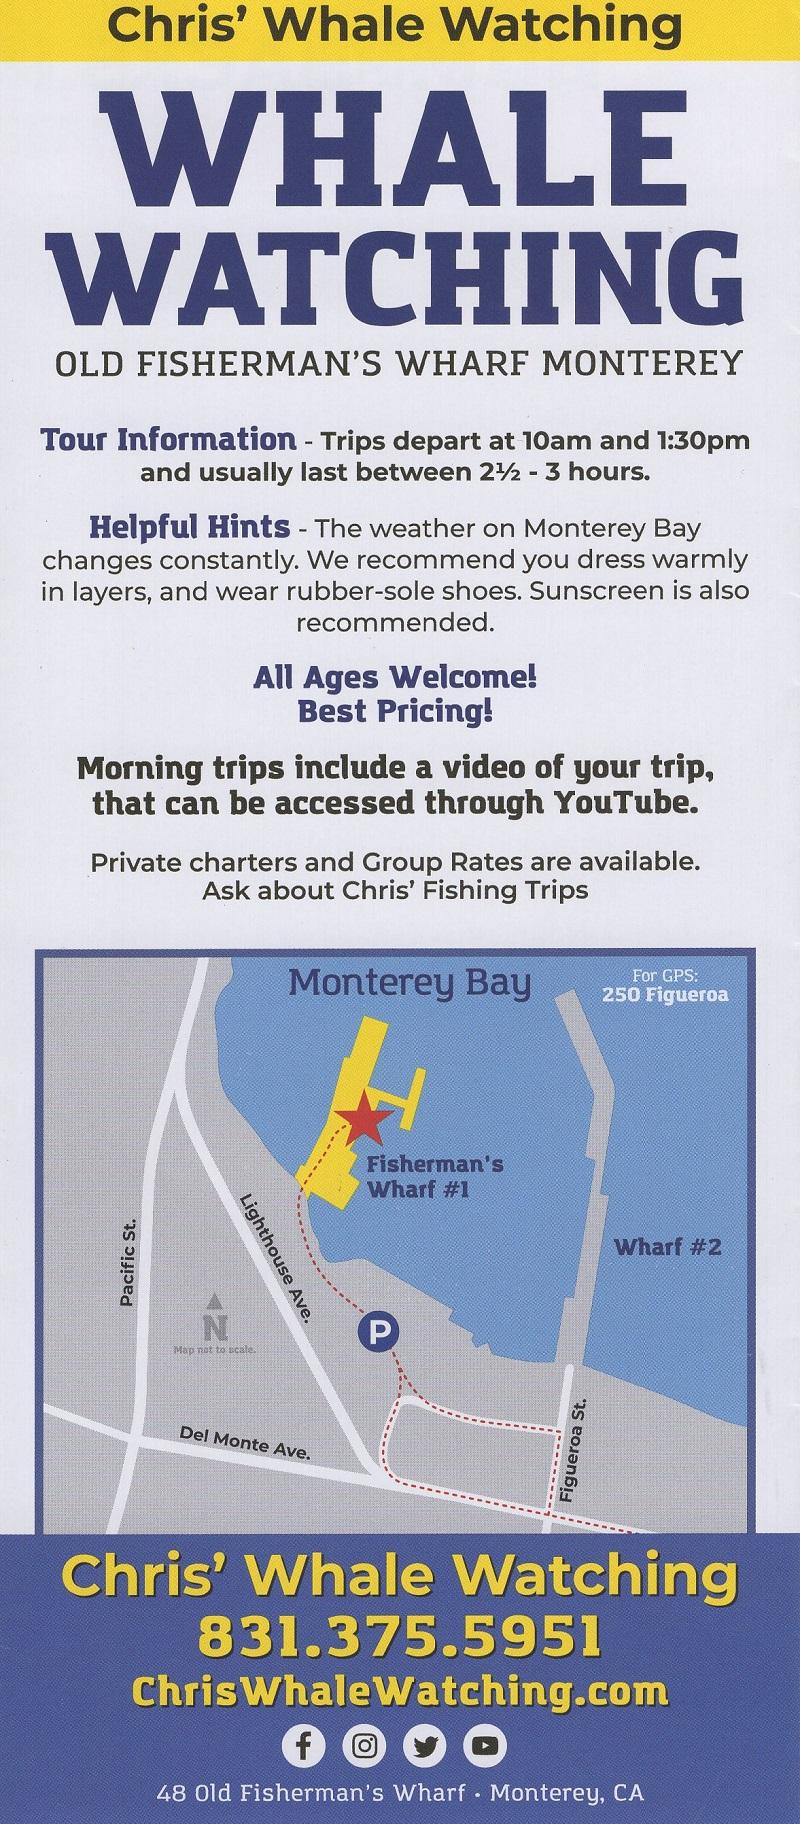 Chris' Whale Watching brochure thumbnail